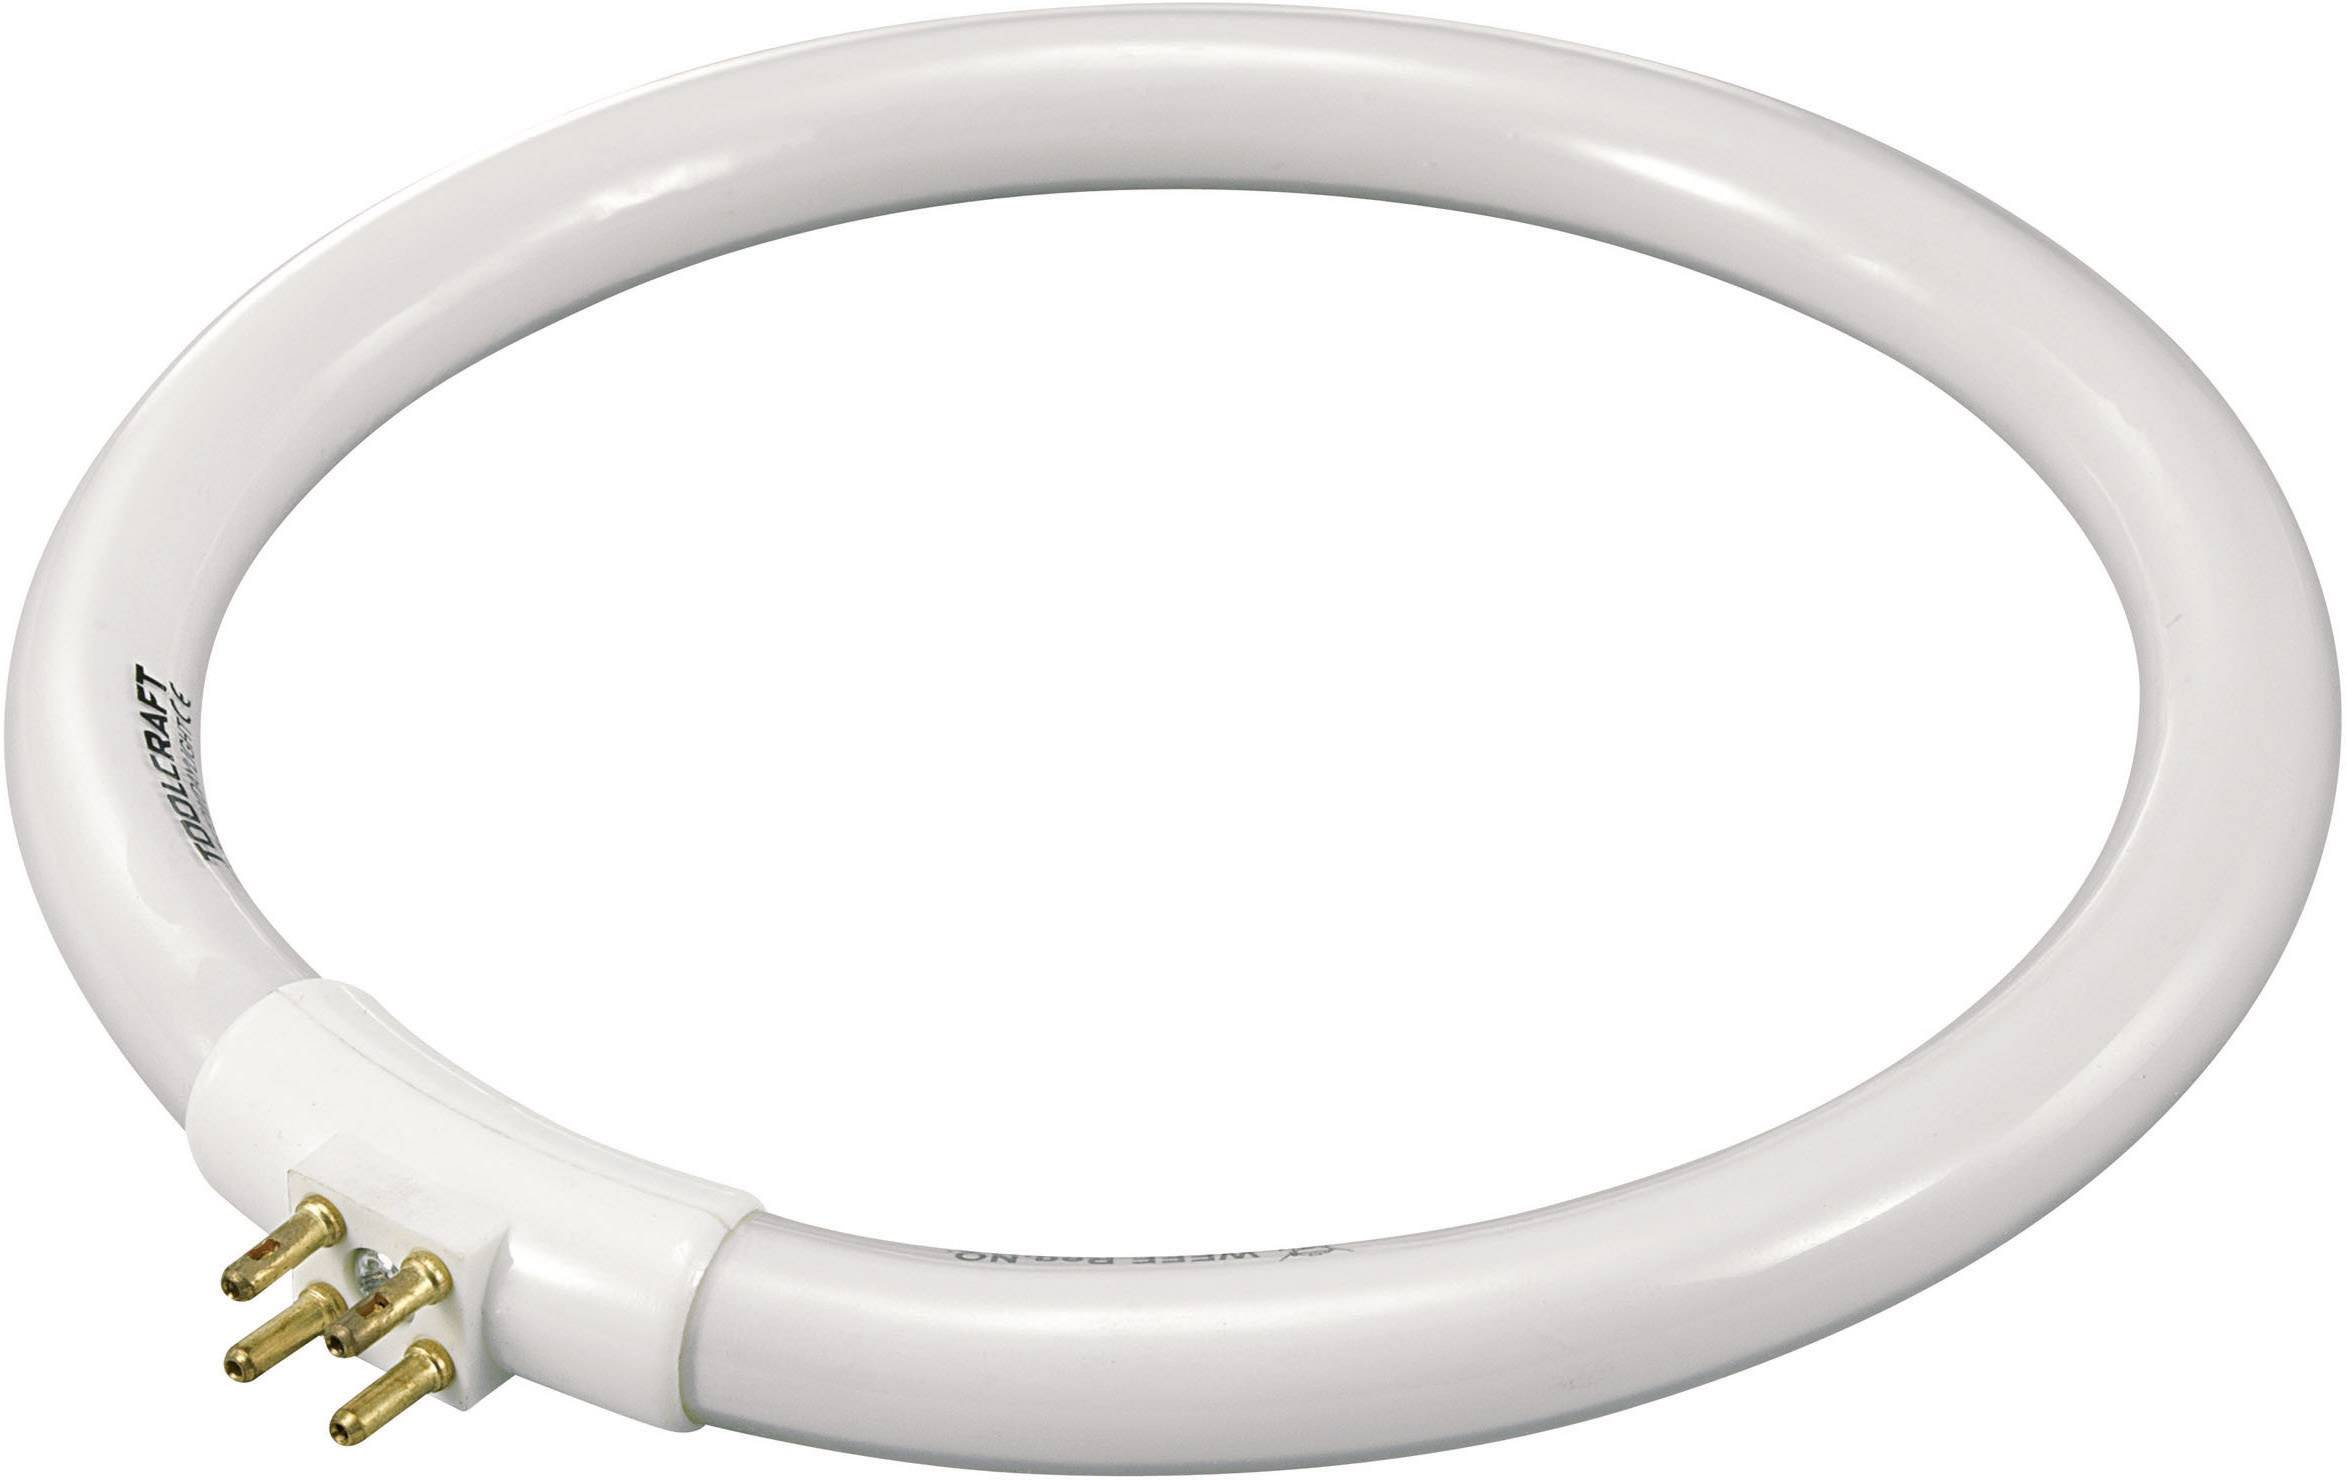 Kruhová trubica s luminoforem T4, 12 W